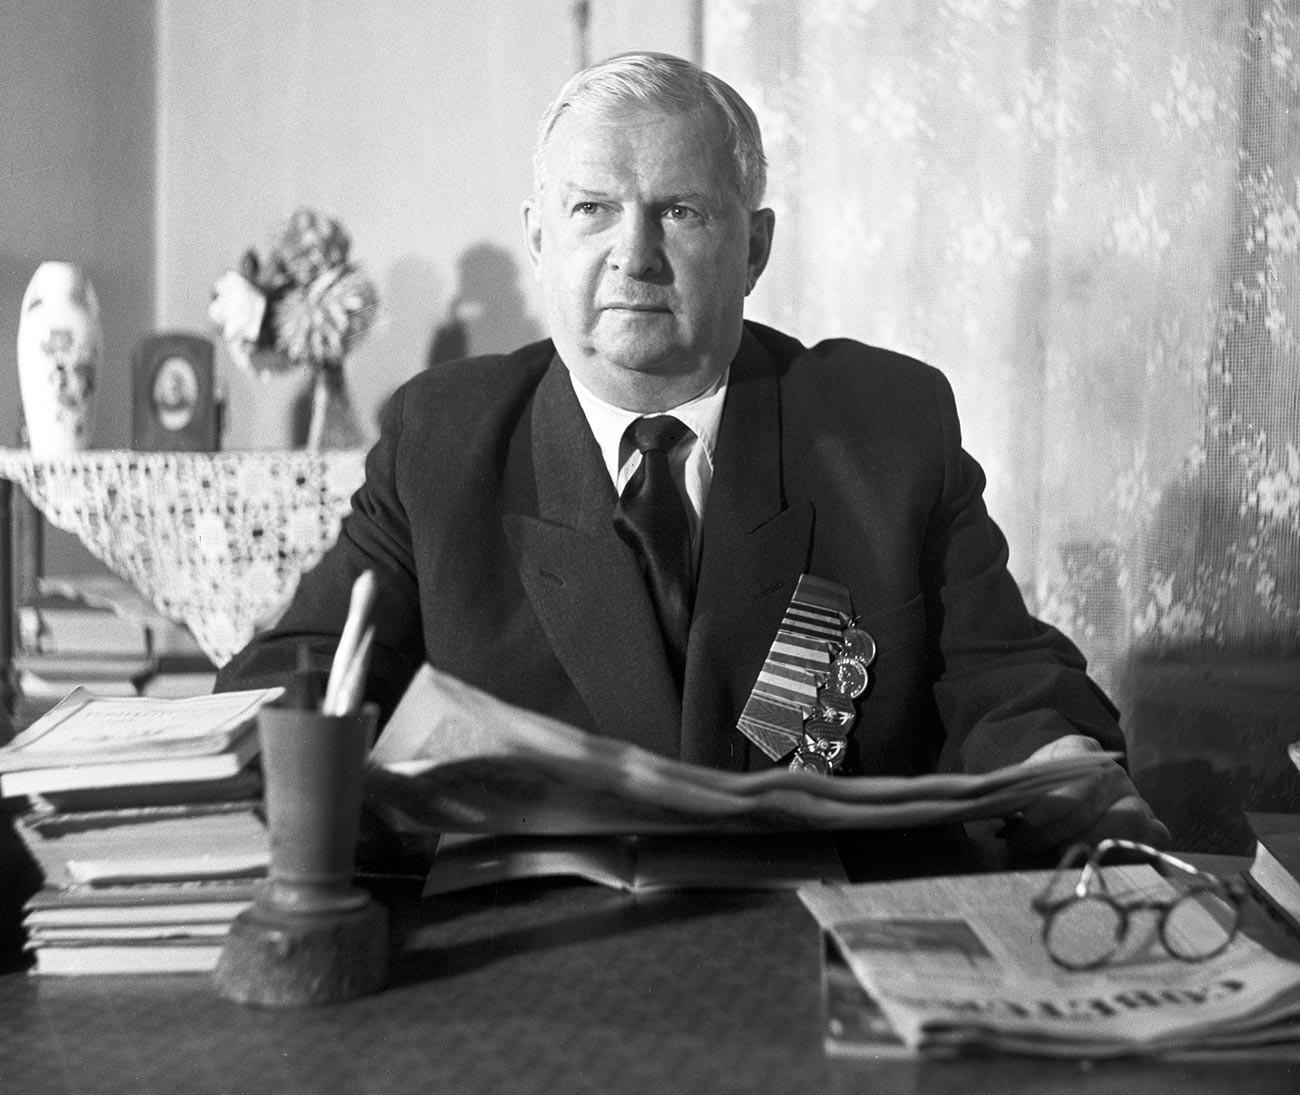 Поранешниот возач на В.И. Ленин и автор на сеќавањата на В.И. Ленин Степан Казимирович Гиљ.